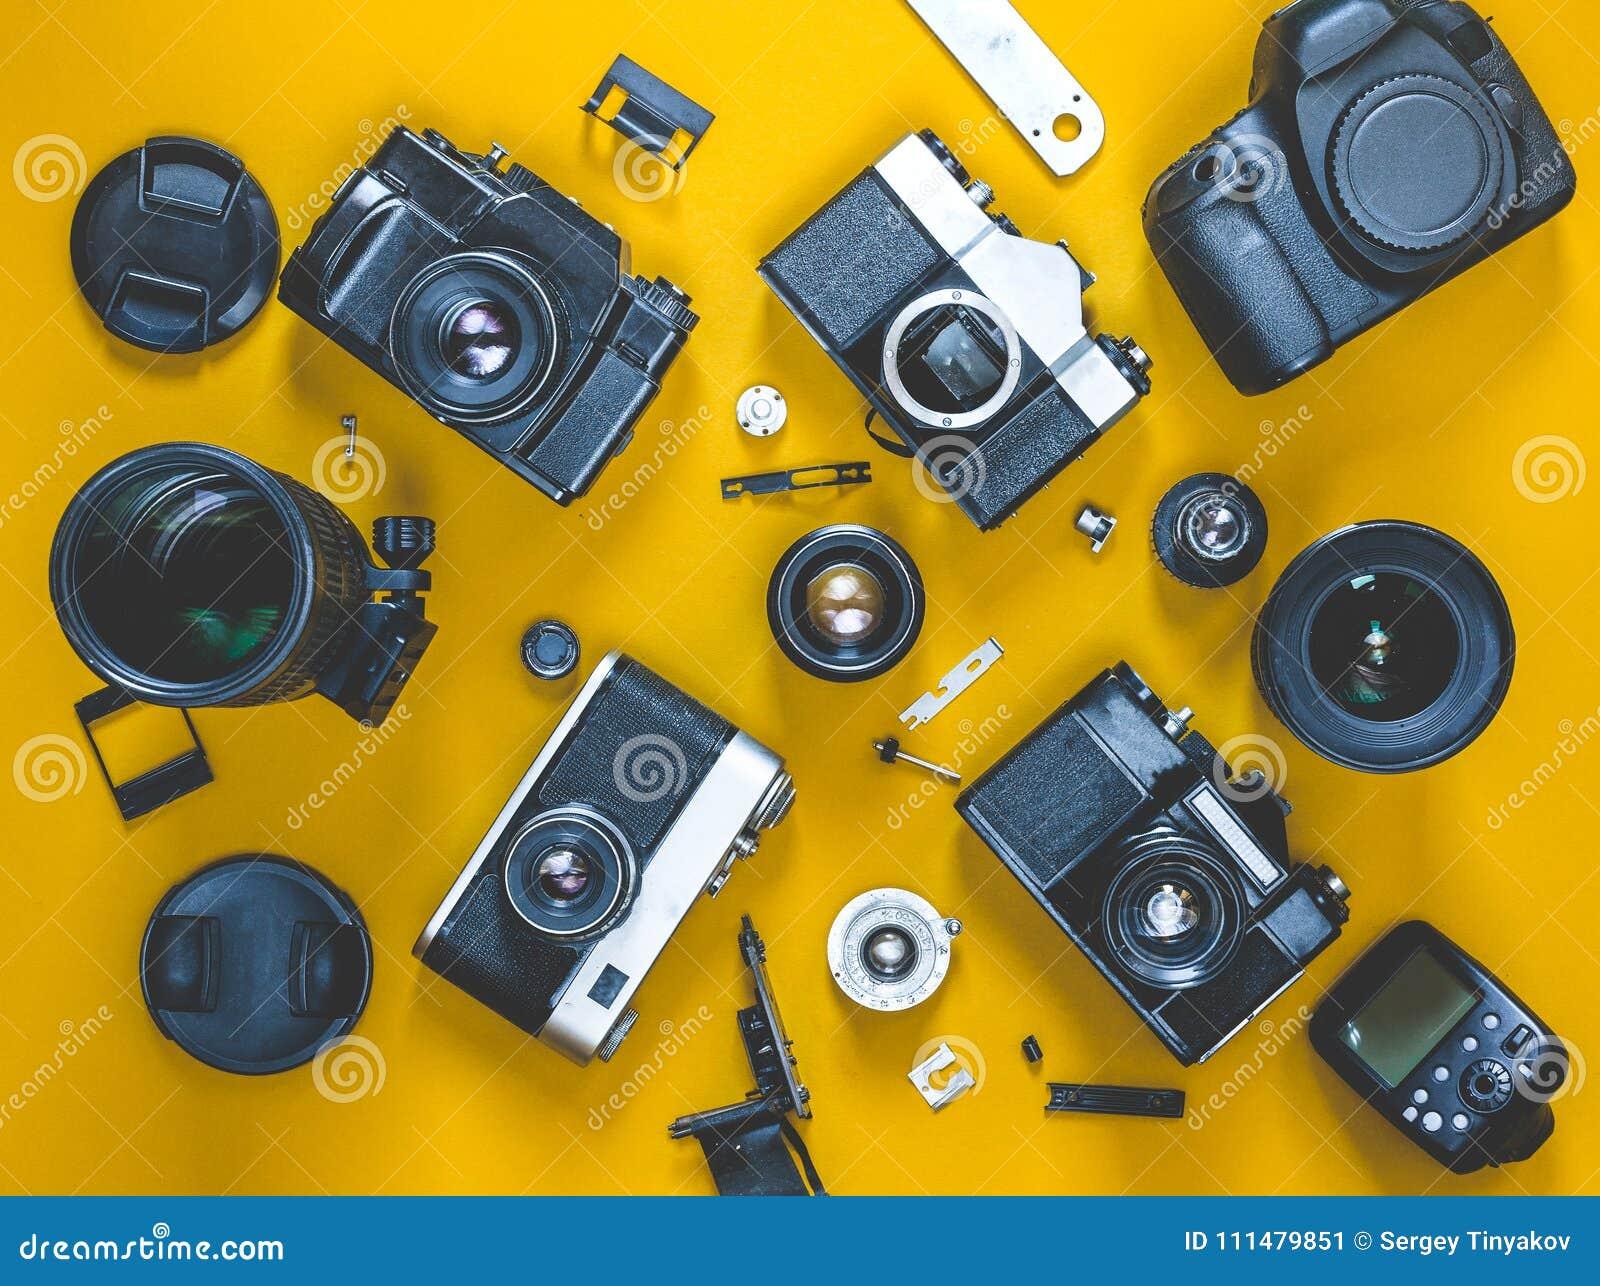 Repair Broken Film Camera Concept, Top View  Photograph